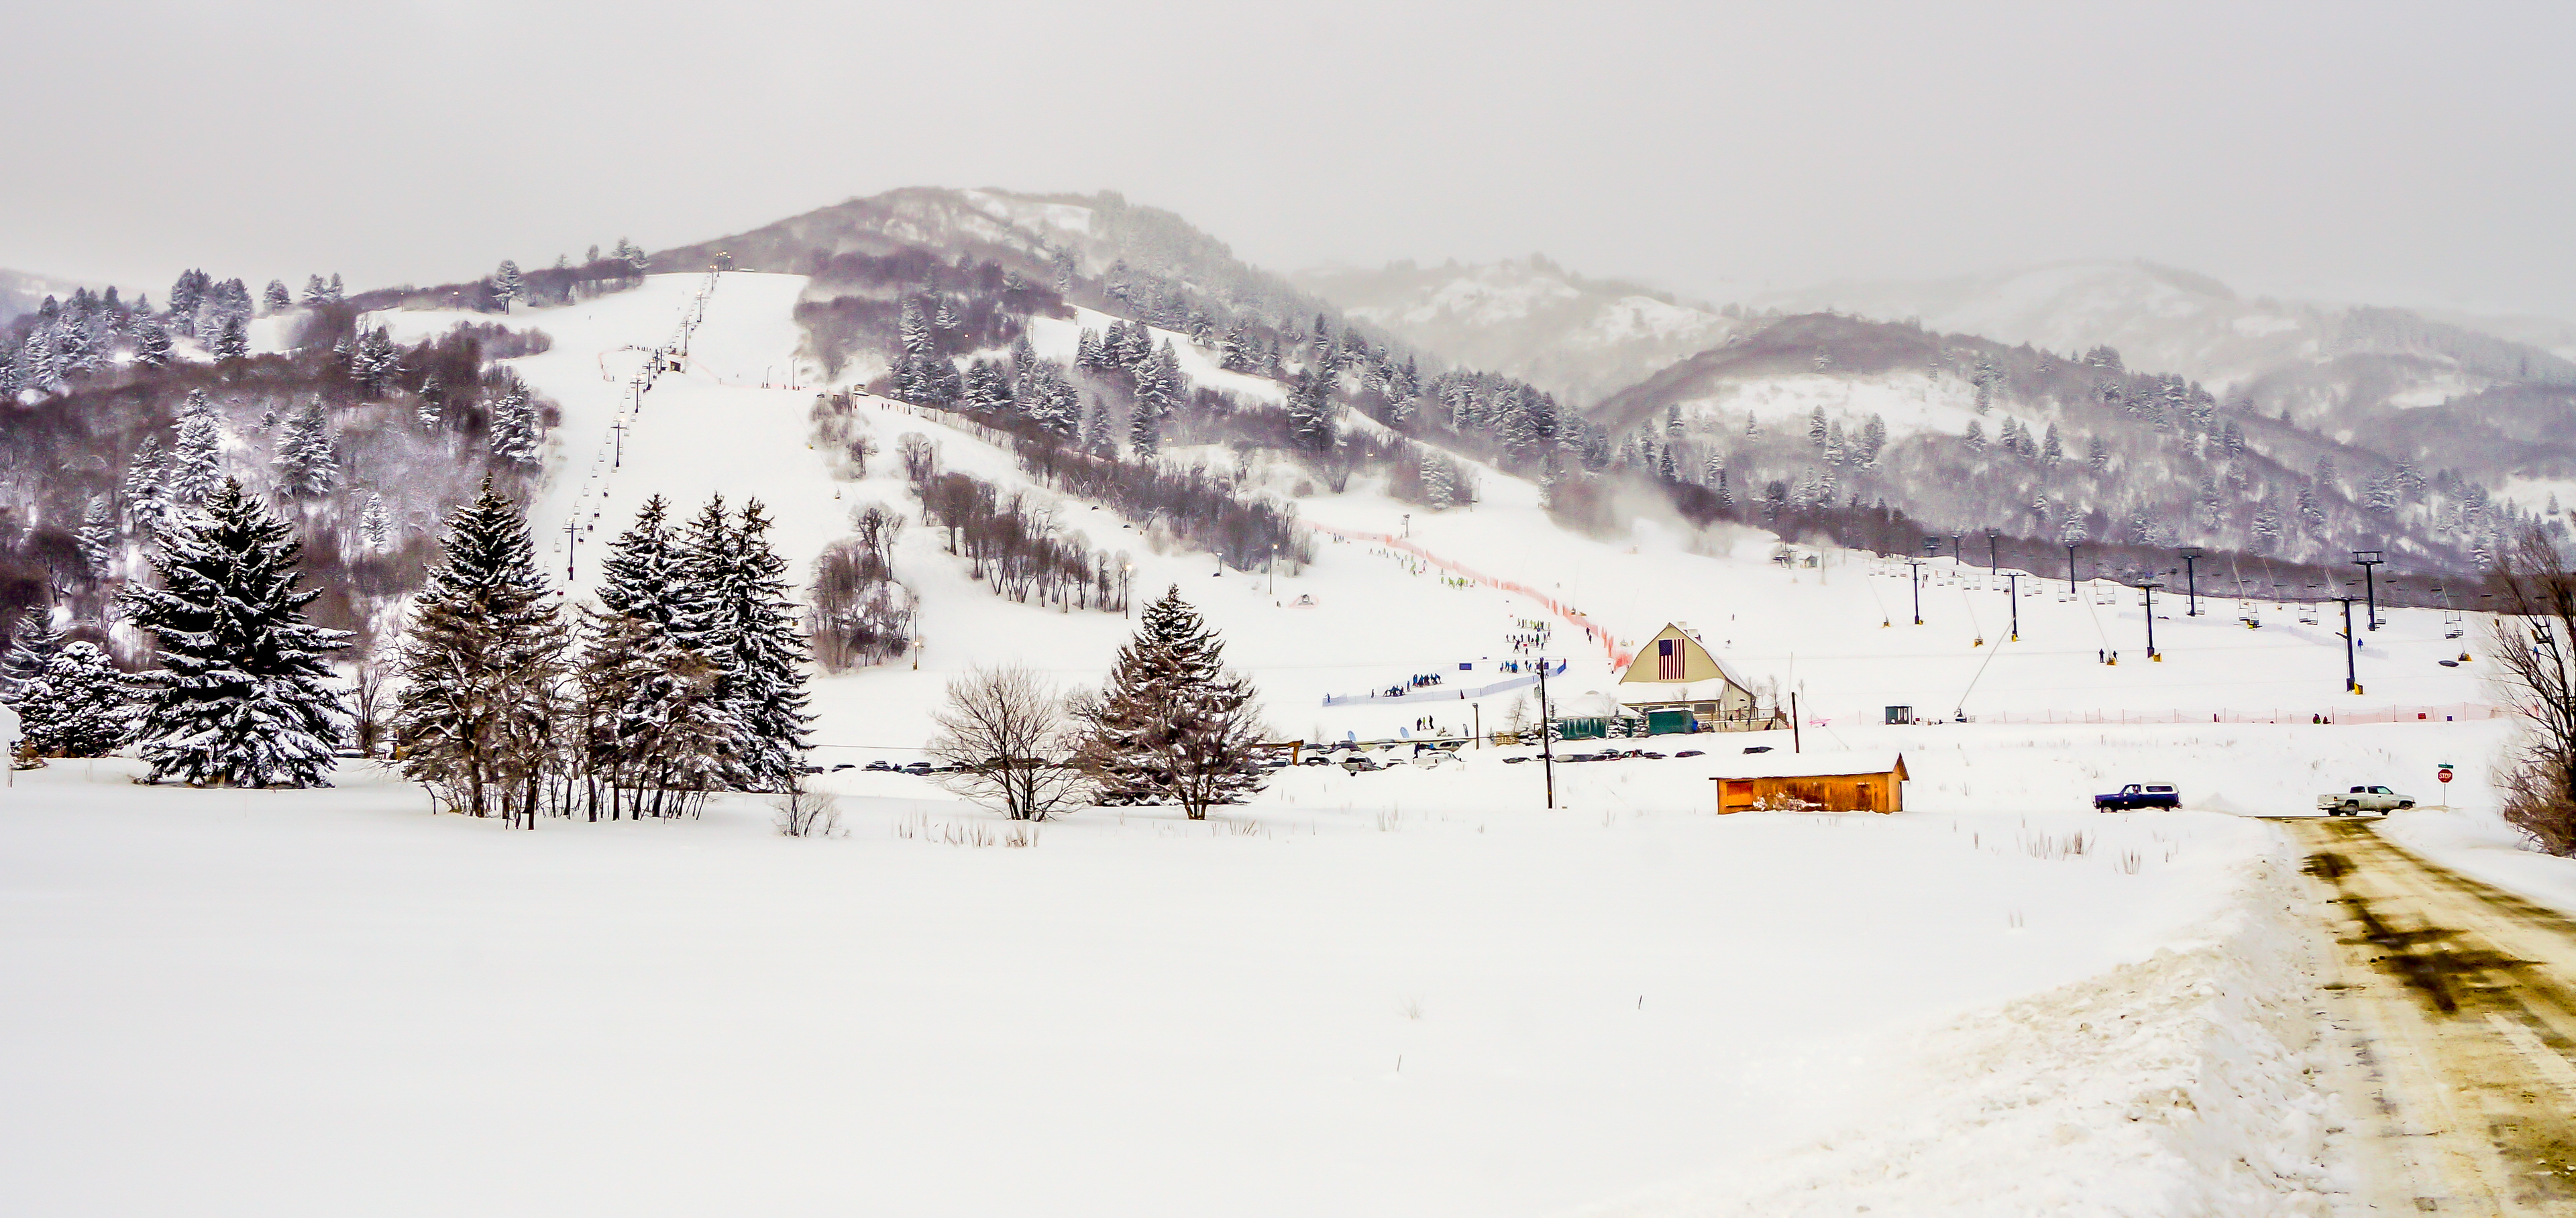 Nordic Valley Ski Resort